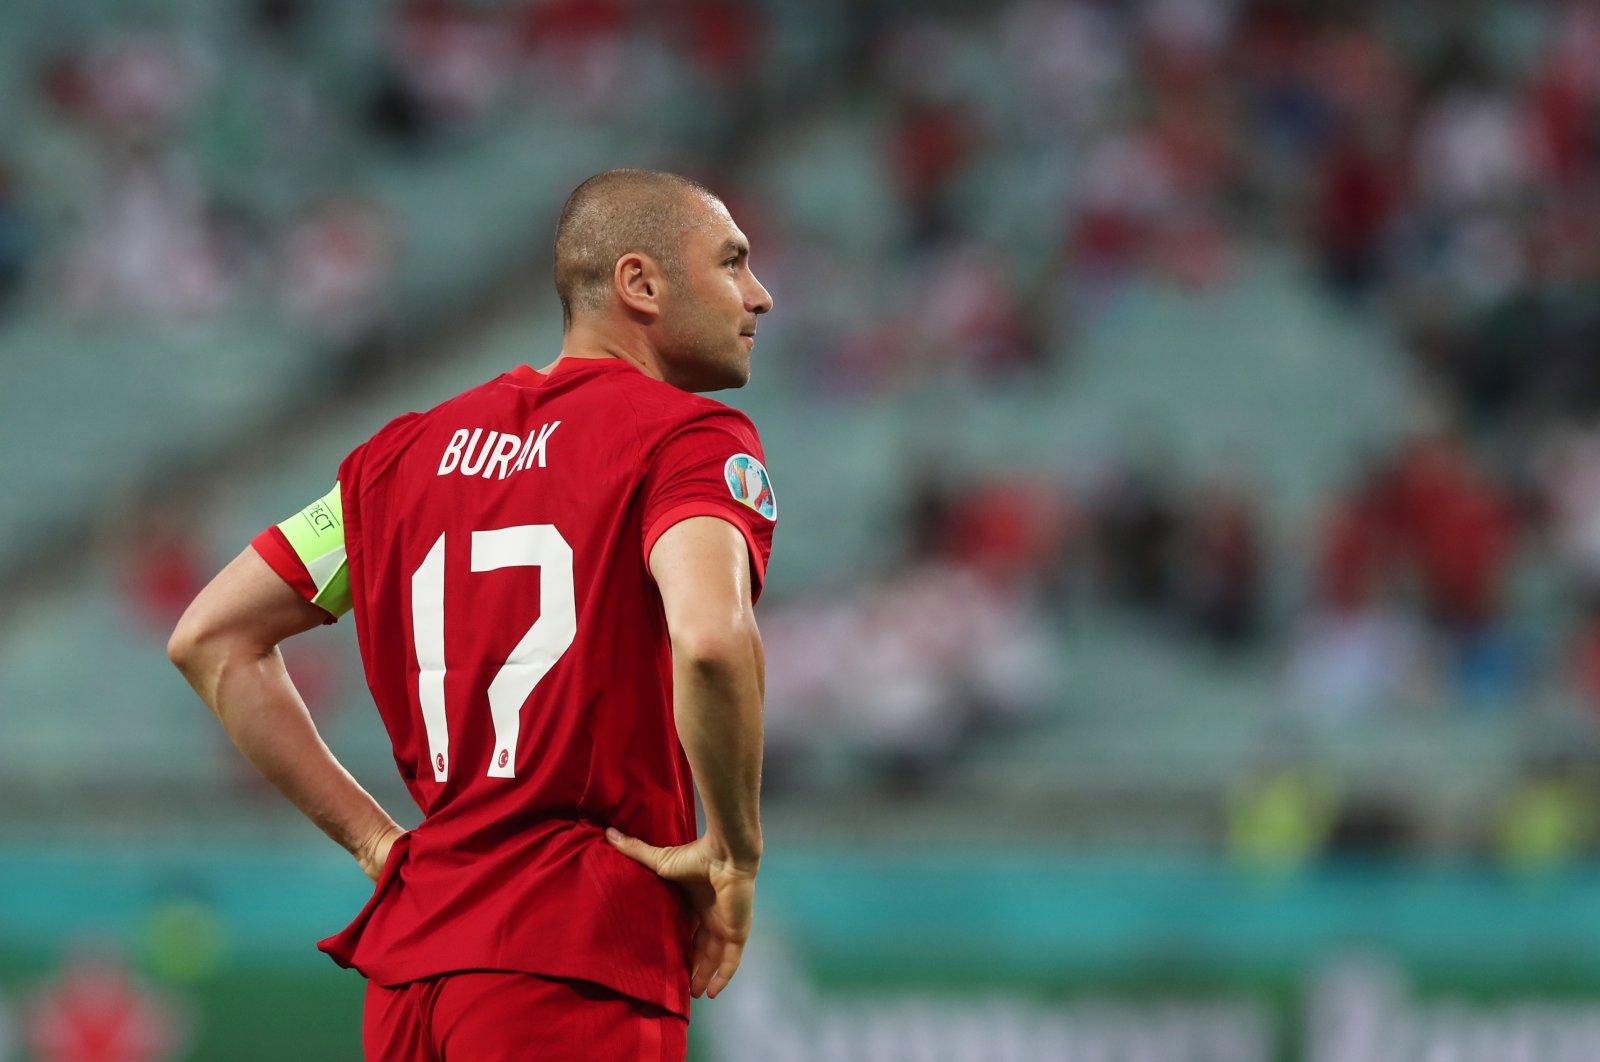 Turkey's Burak Yılmaz reacts during a Euro 2020 match against Wales at the Baku Olympic Stadium, in Baku, Azerbaijan, June 16, 2021. (EPA Photo)